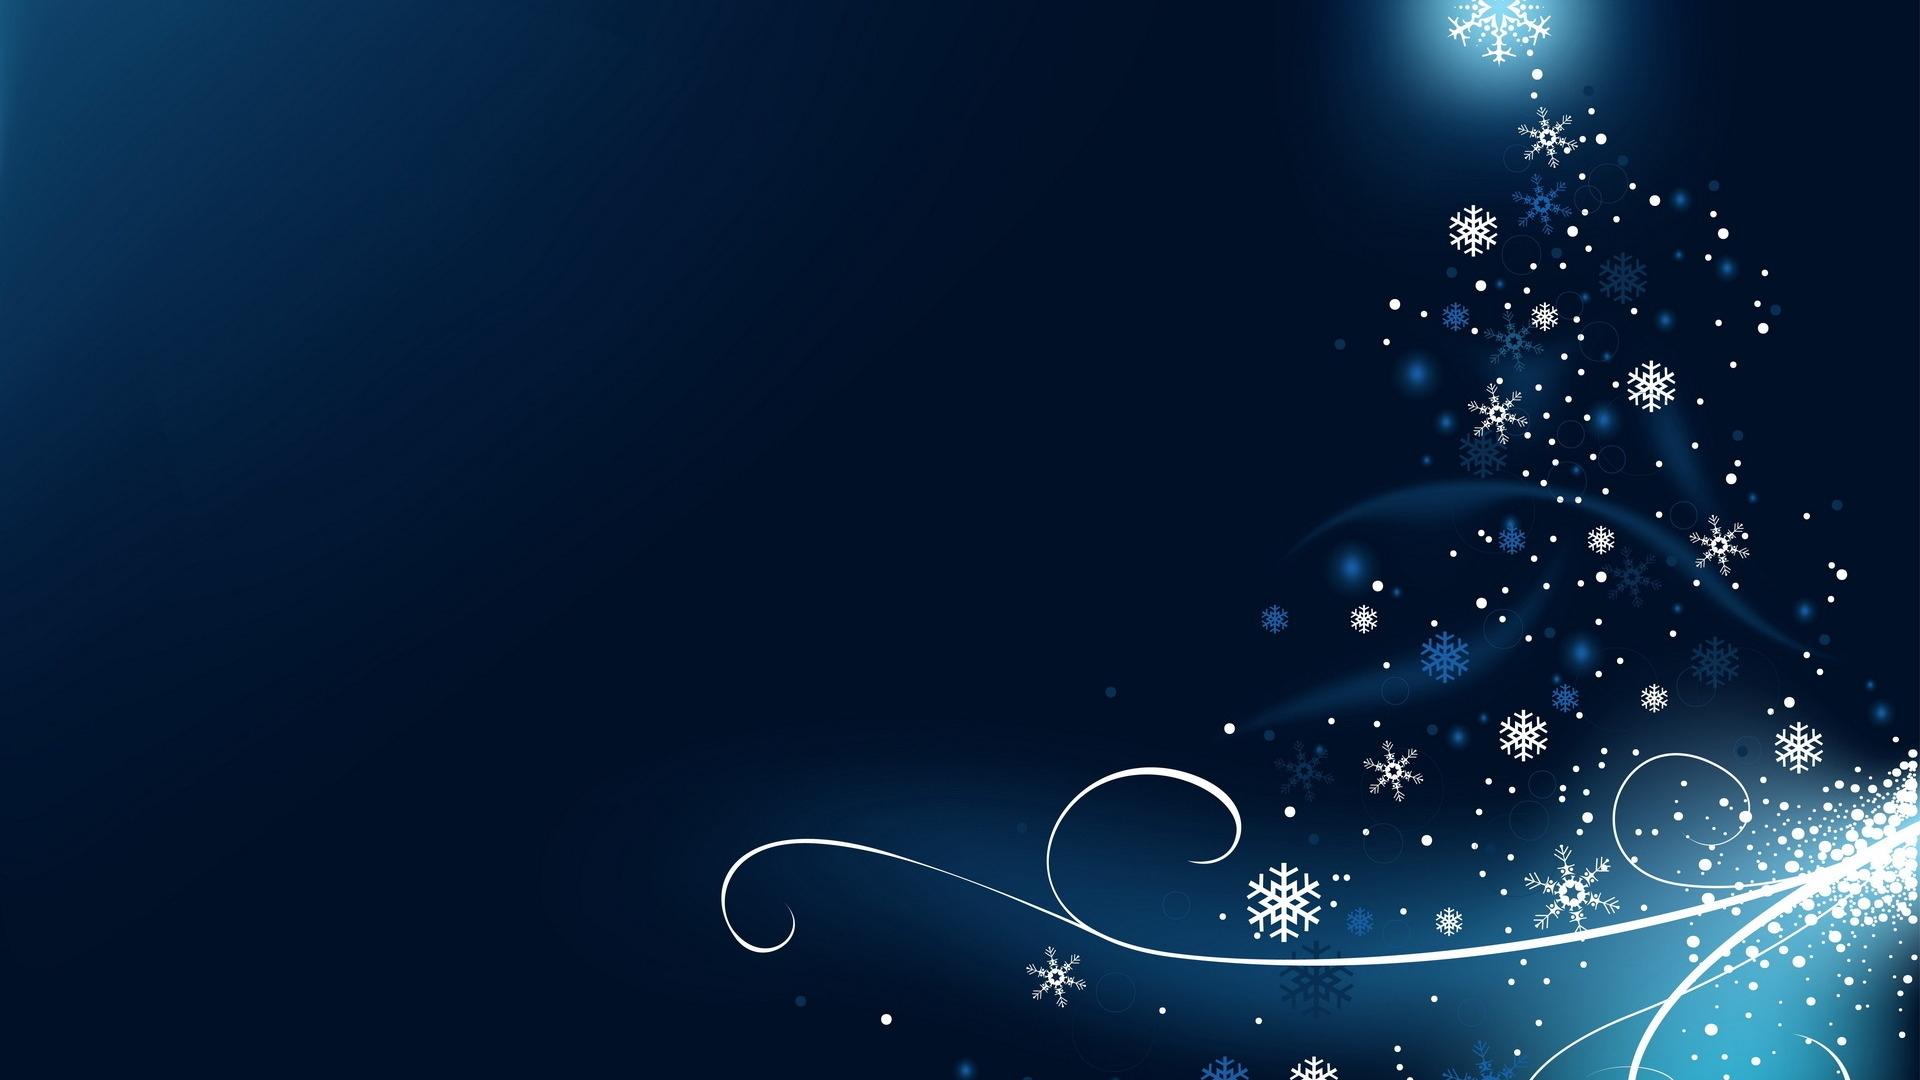 Themes Christmas Snowflake Theme